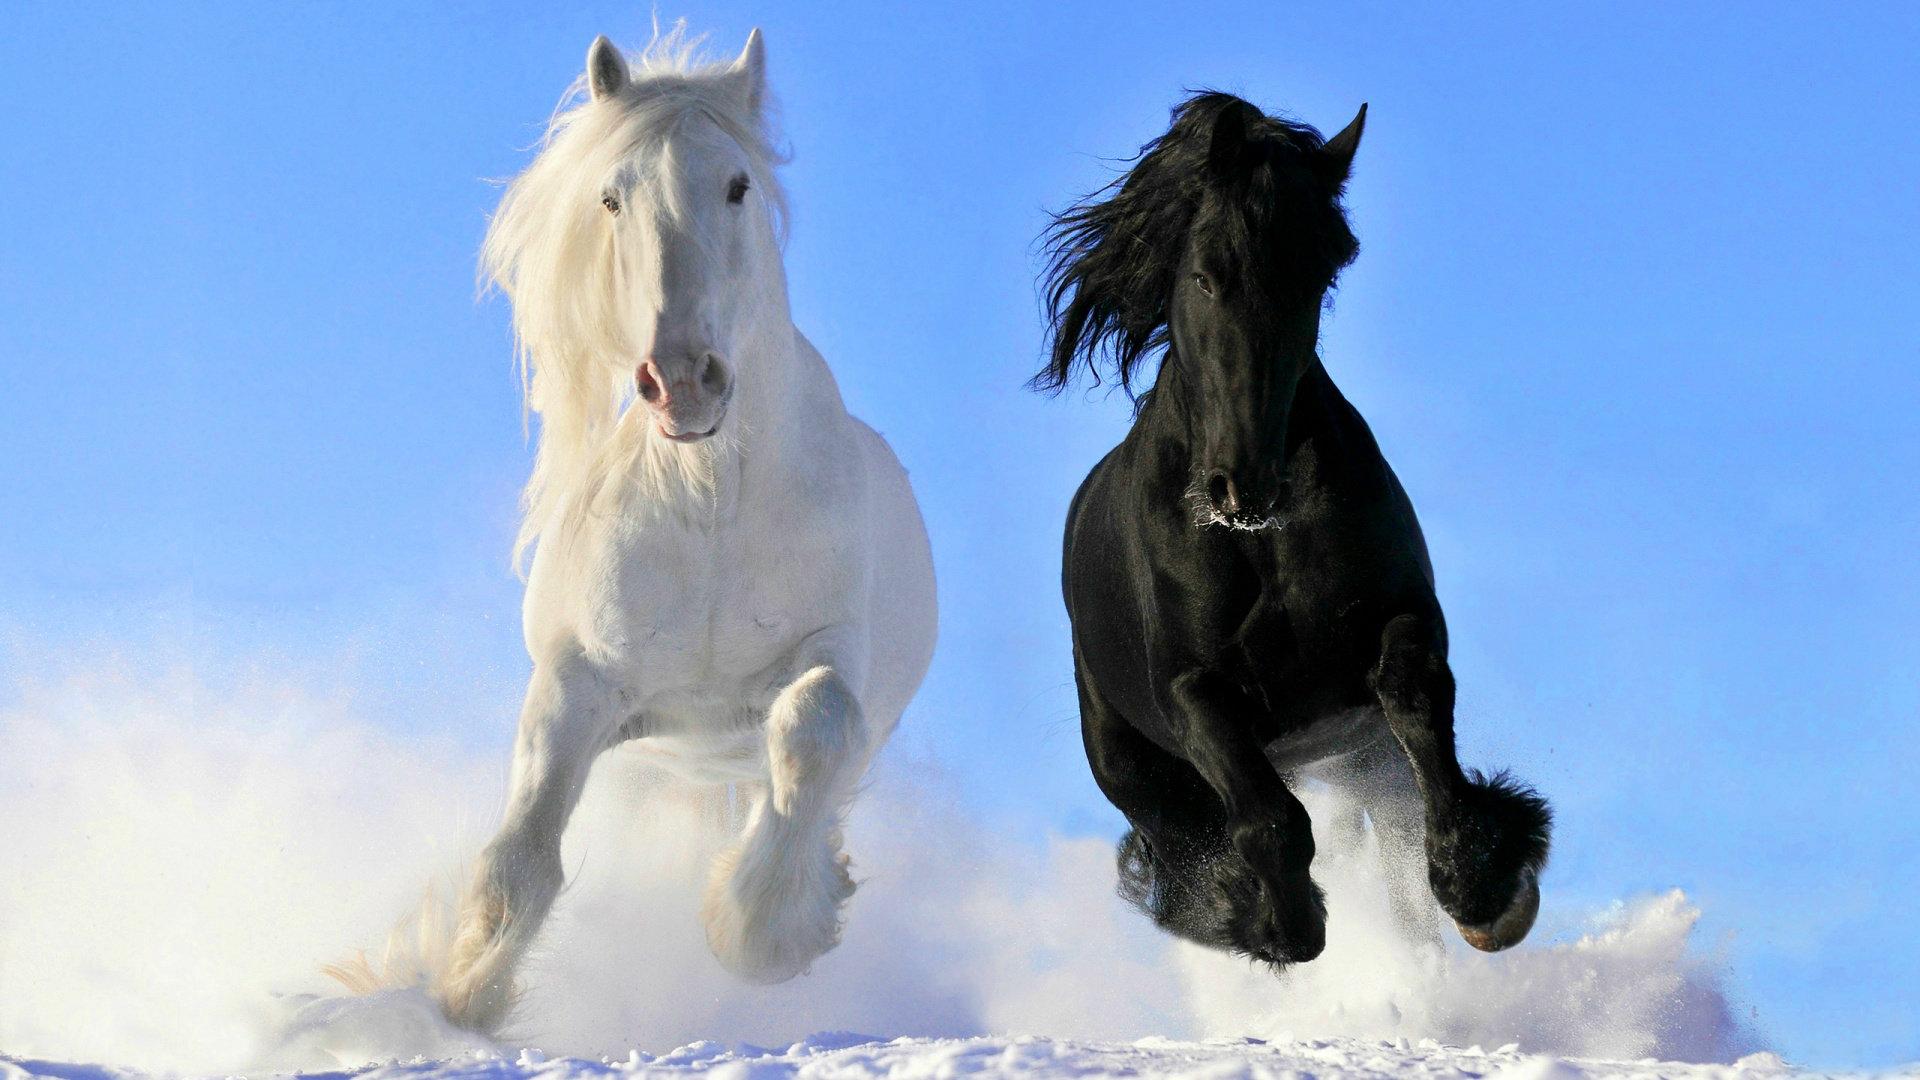 Horses HD Wallpapers Horse Desktop Wallpapers 1080p HD 1920x1080